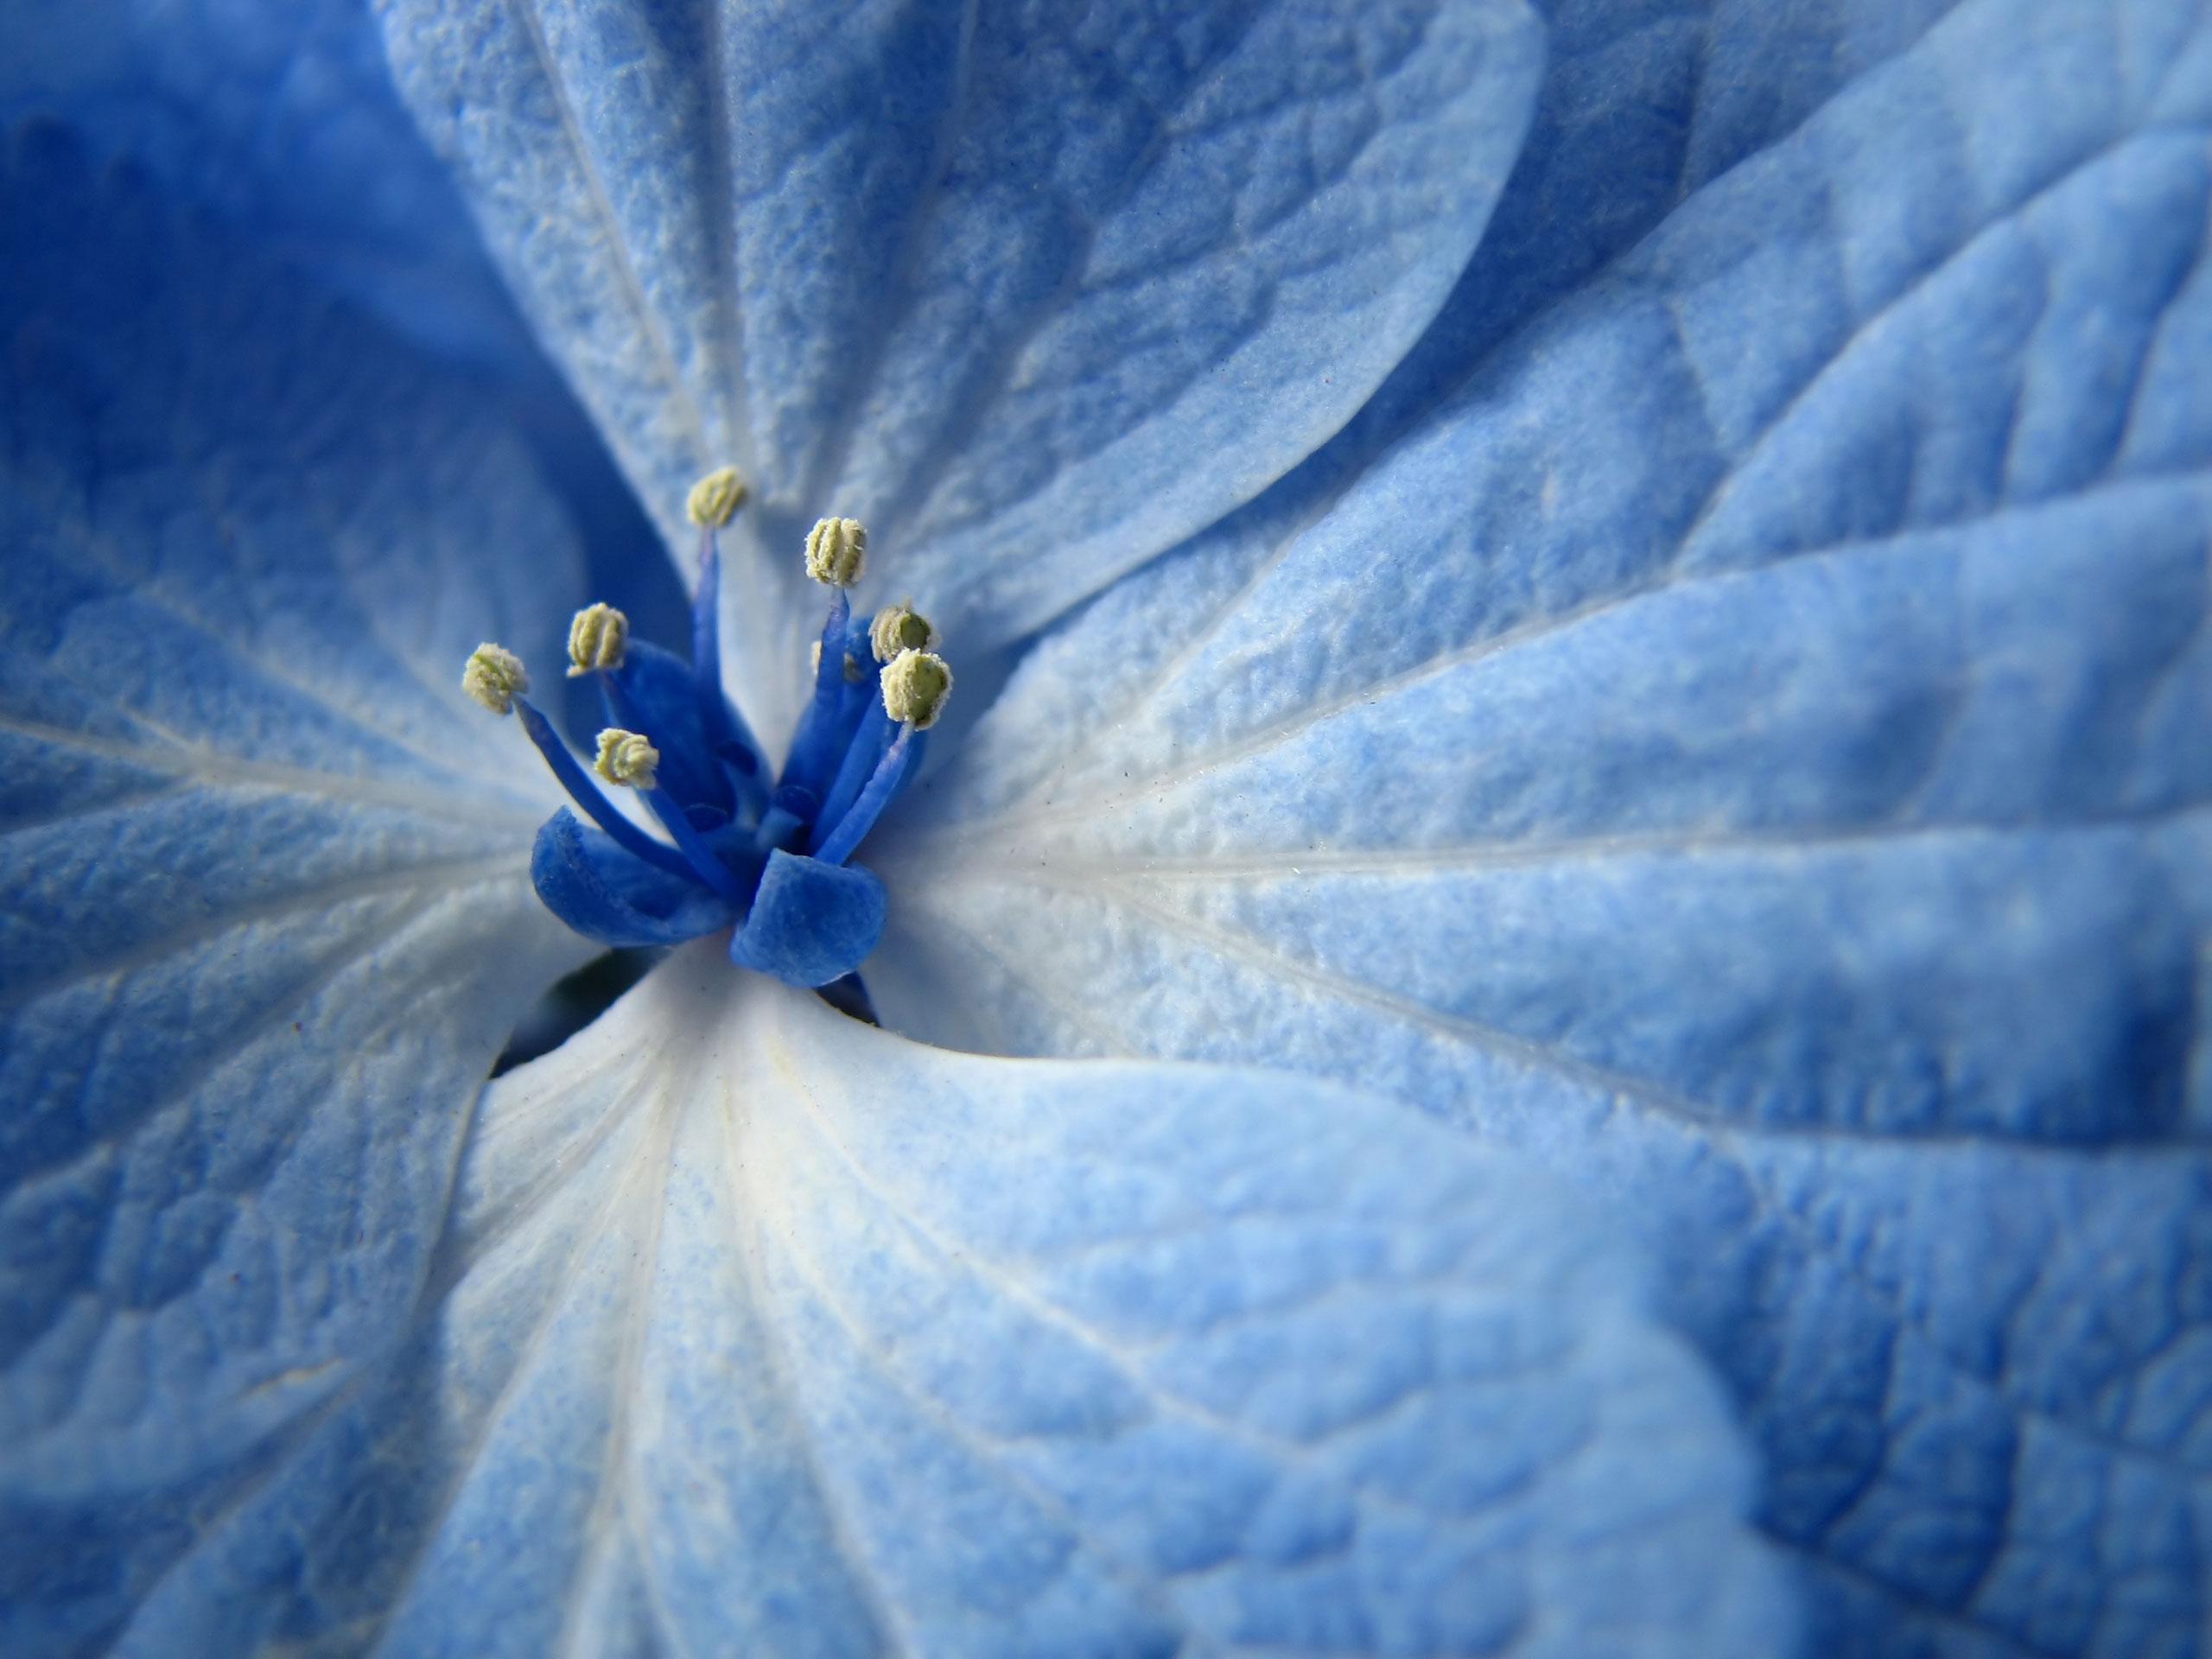 47 Blue Floral Wallpaper For Walls On Wallpapersafari